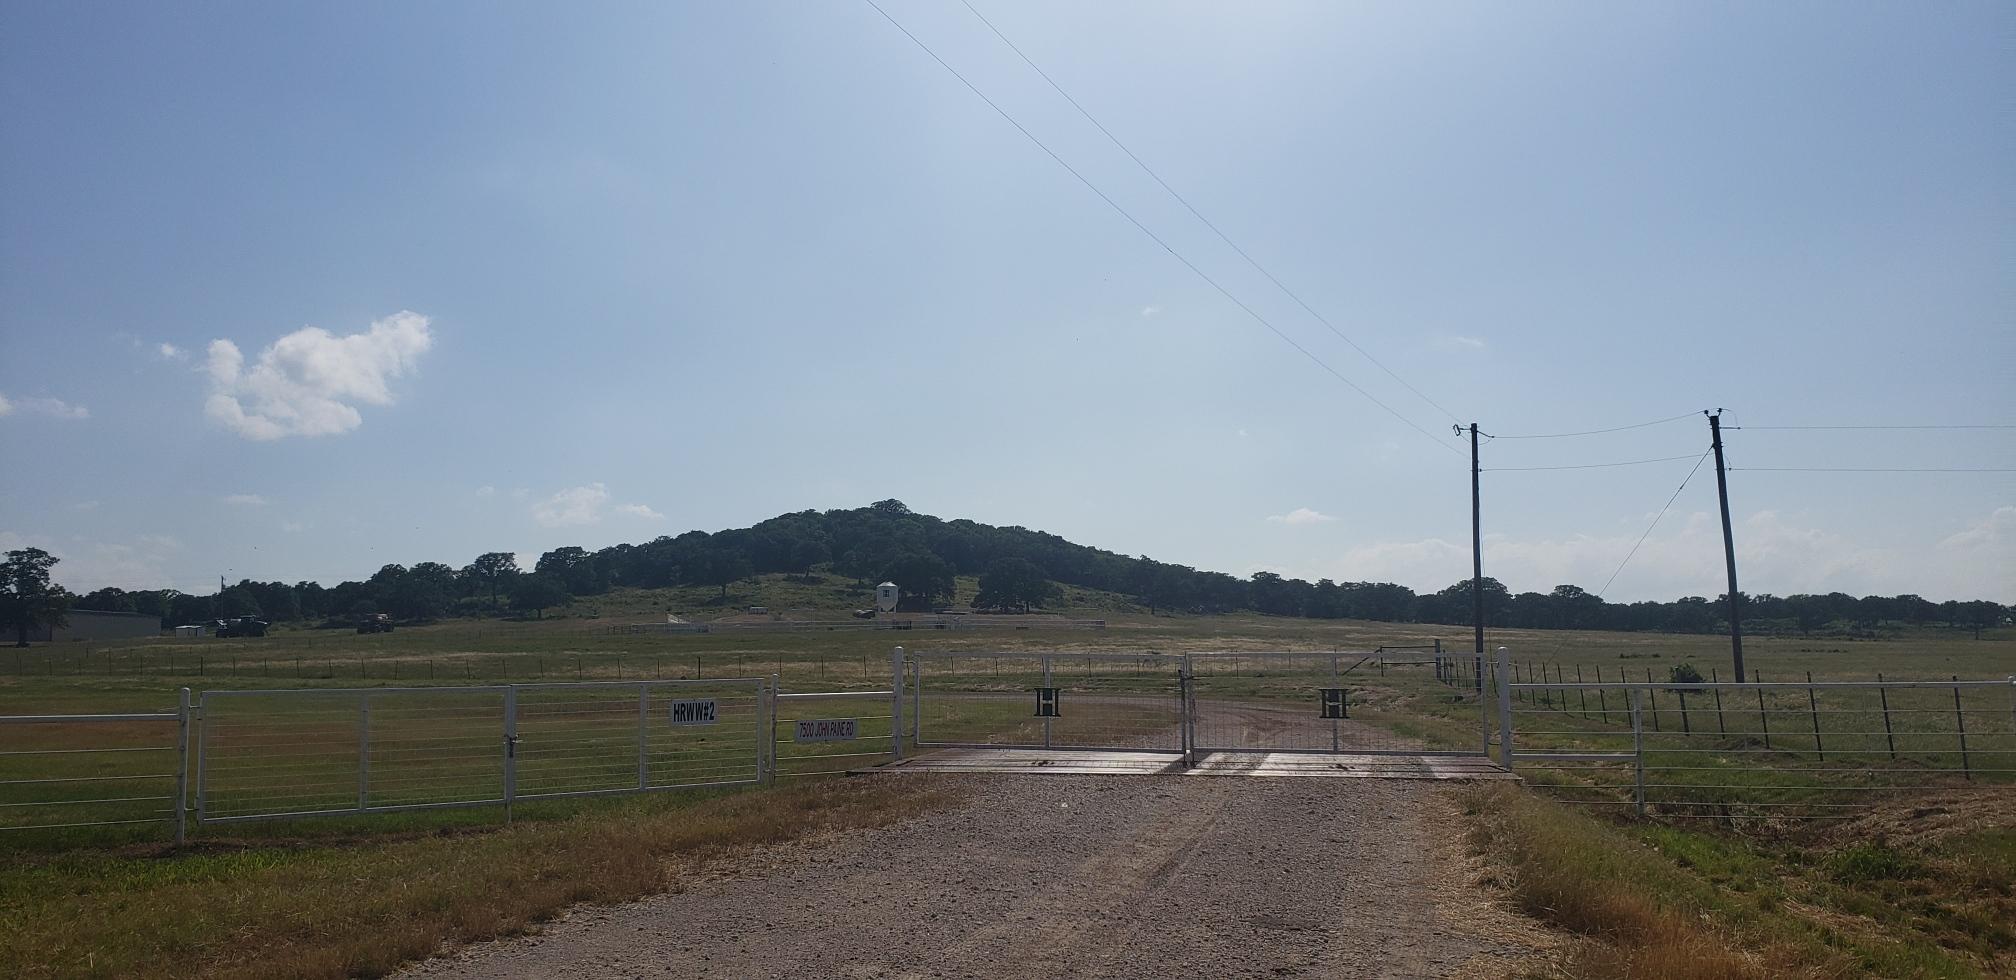 Argyle, Texas (United States)